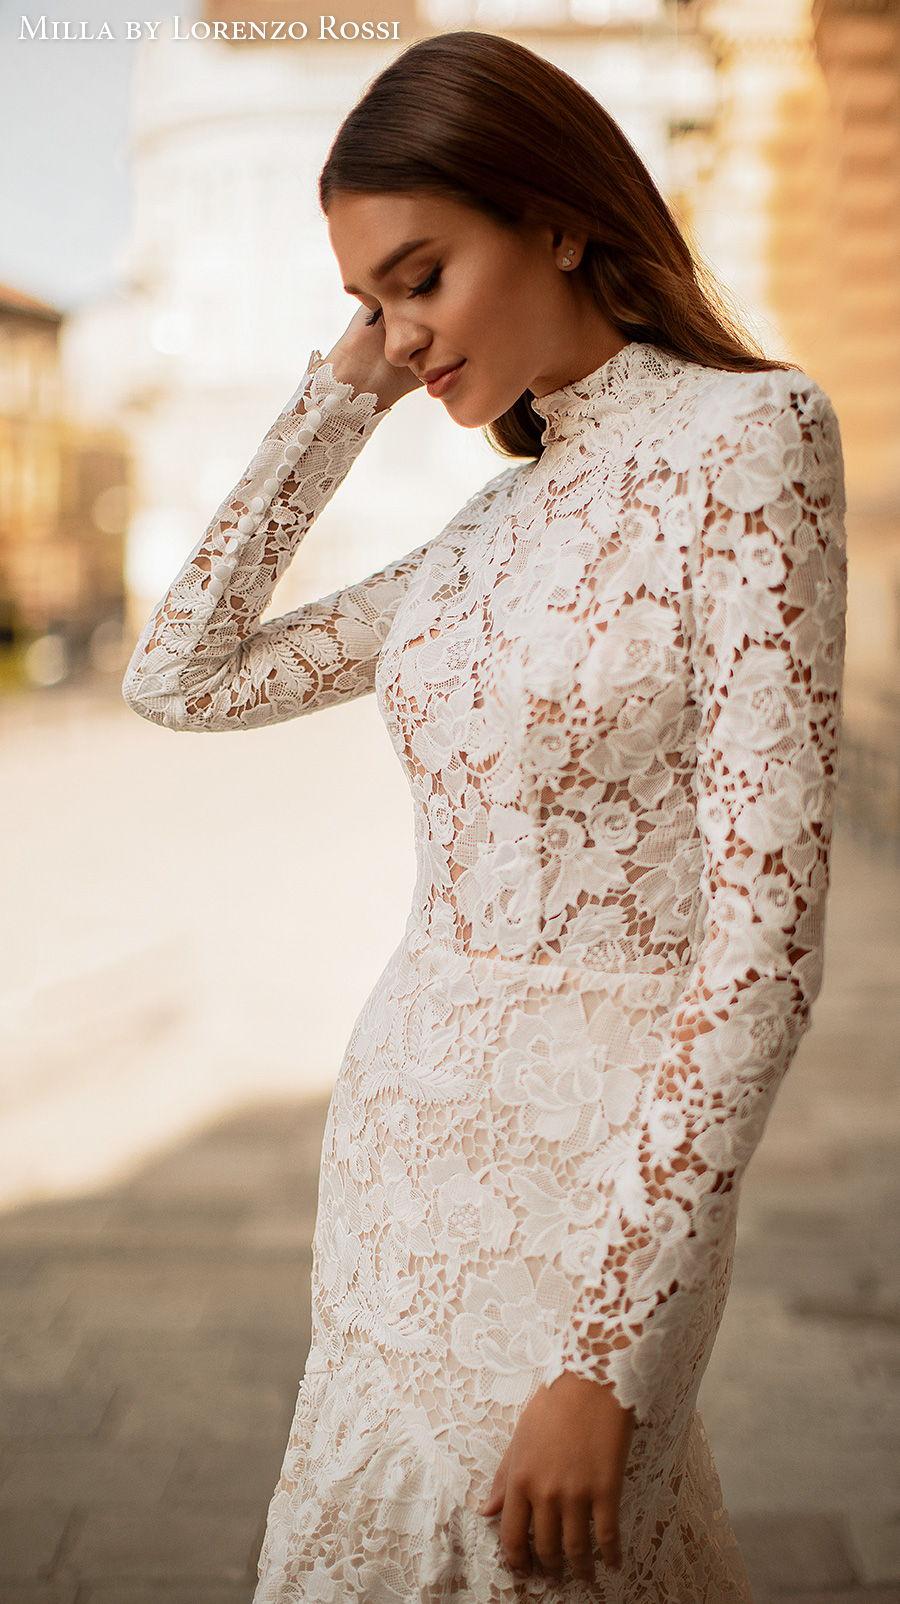 milla lorenzo rossi 2021 bridal long sleeves high neck full embellishment modest elegant mermaid wedding dress covered lace back chapel train (viola) zv